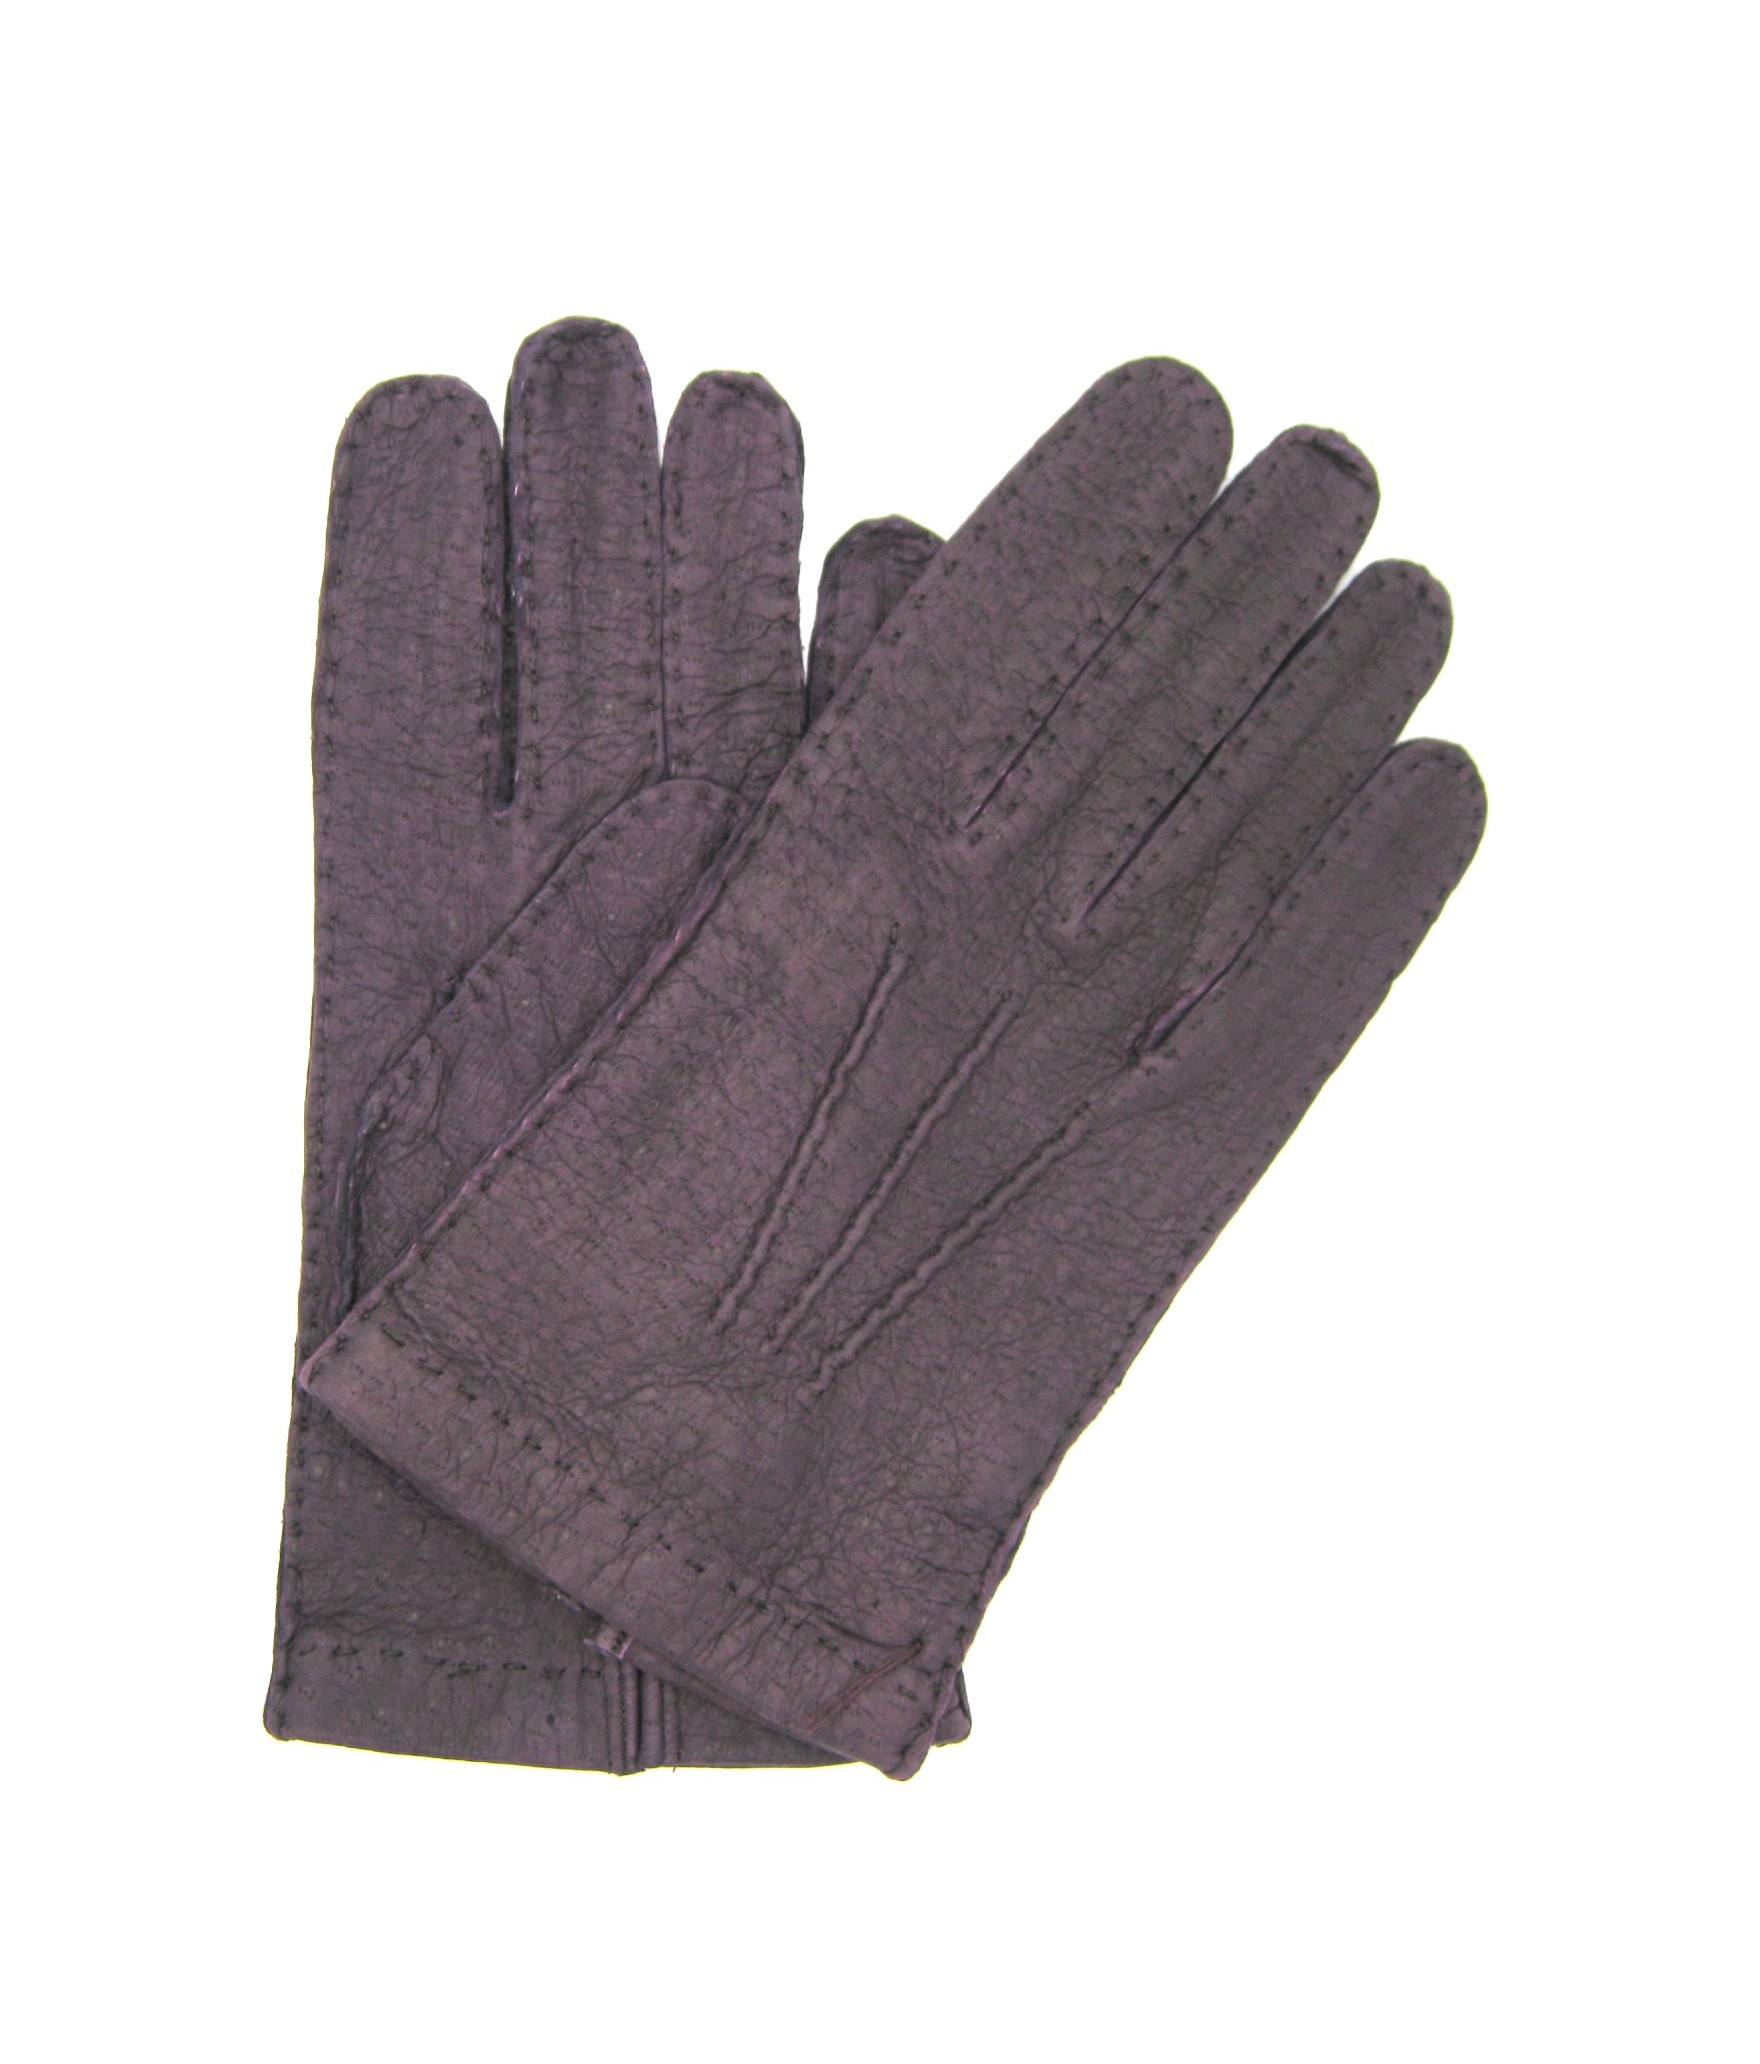 Unlined Peccary leather gloves, Hand Stitching Purple Sermoneta